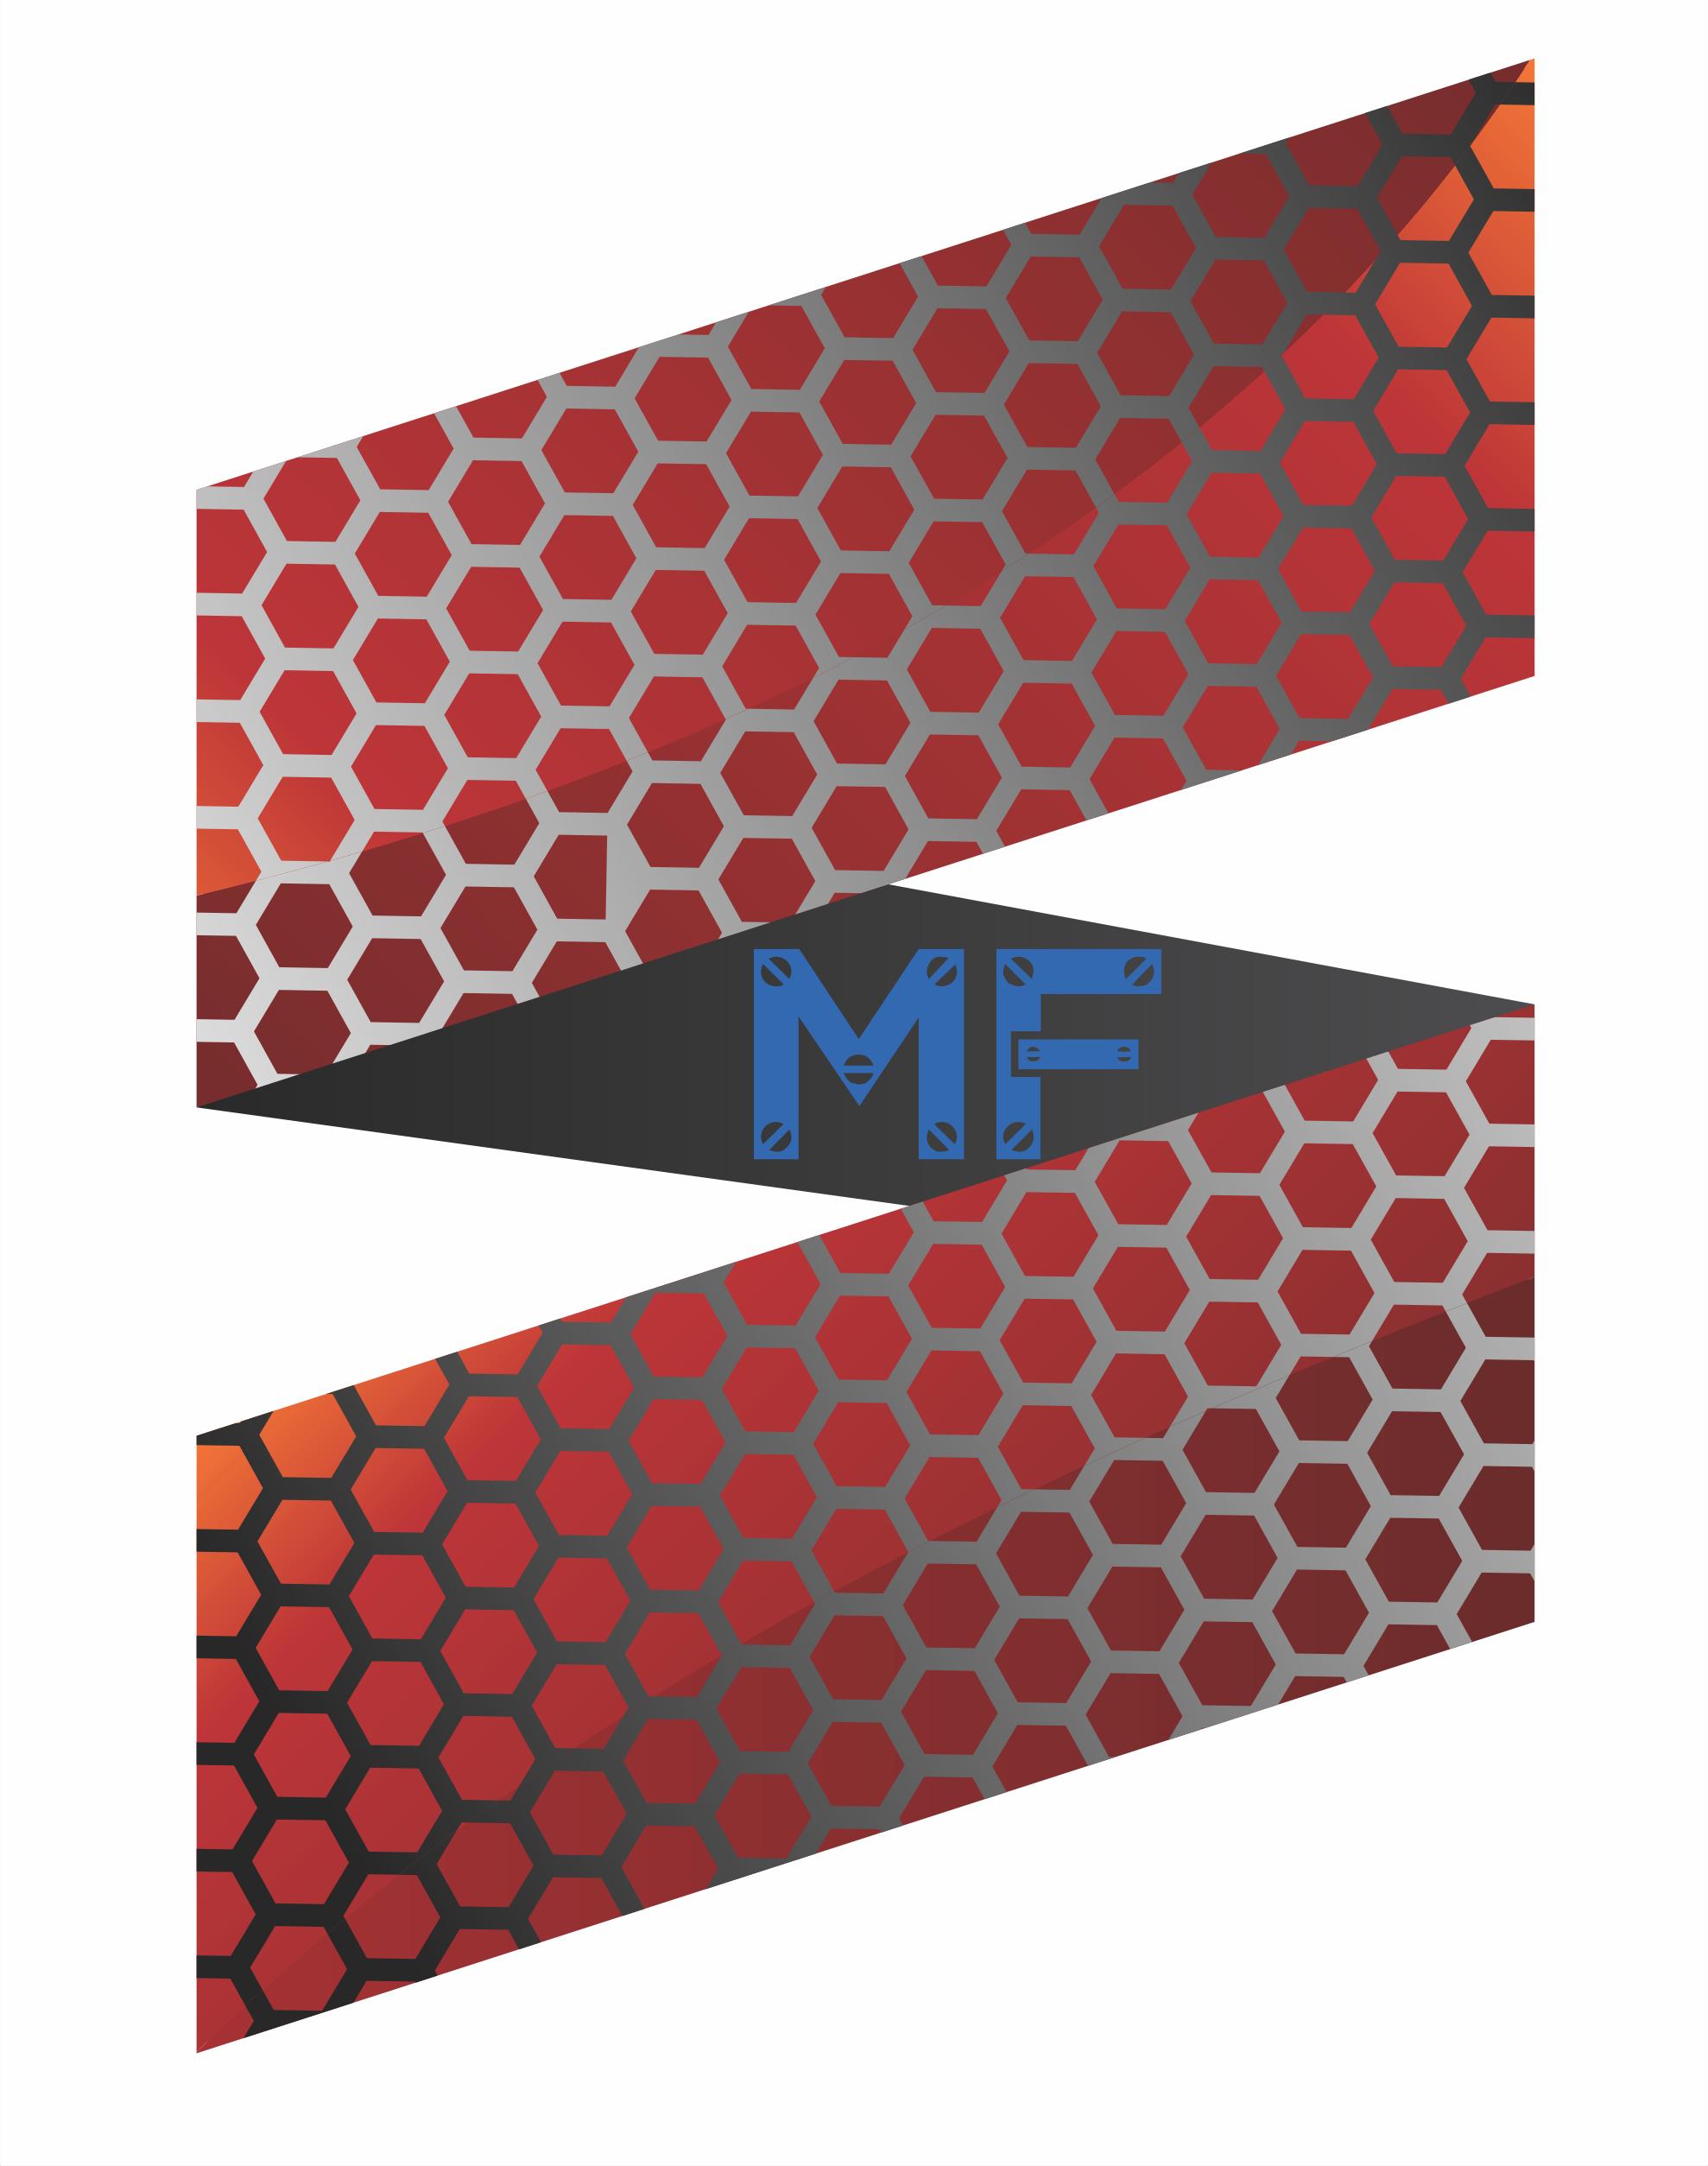 Smart Metal Fabrication